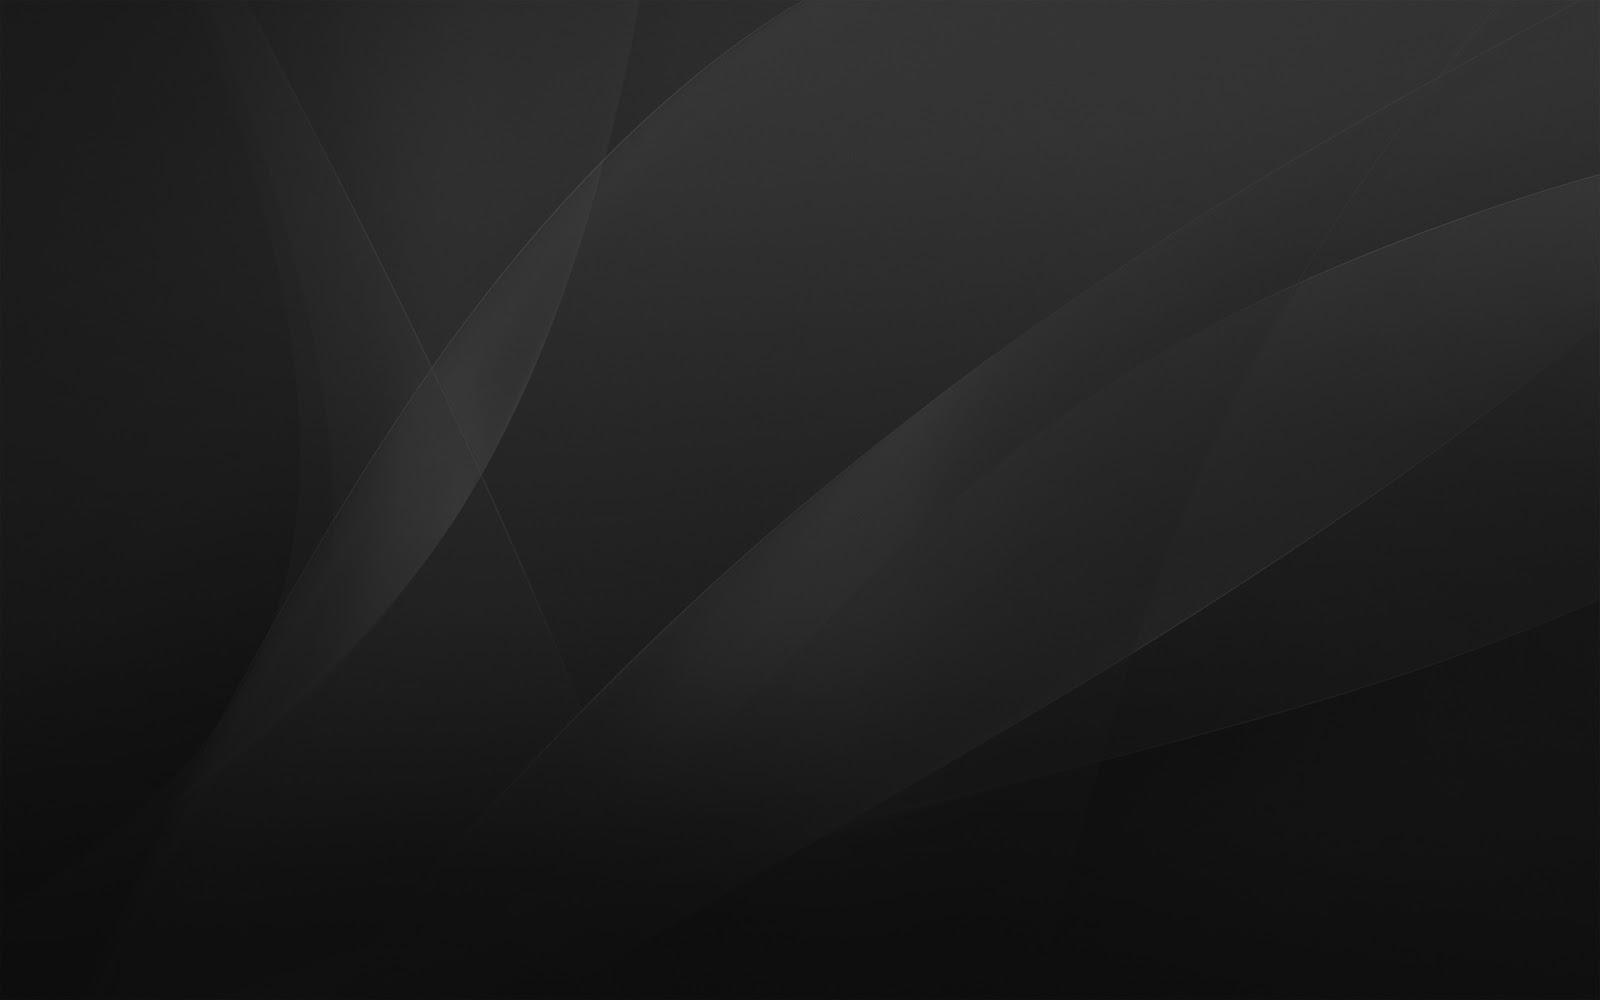 Download image Fundo Imagem Sol Laranja Imagens Preta PC, Android